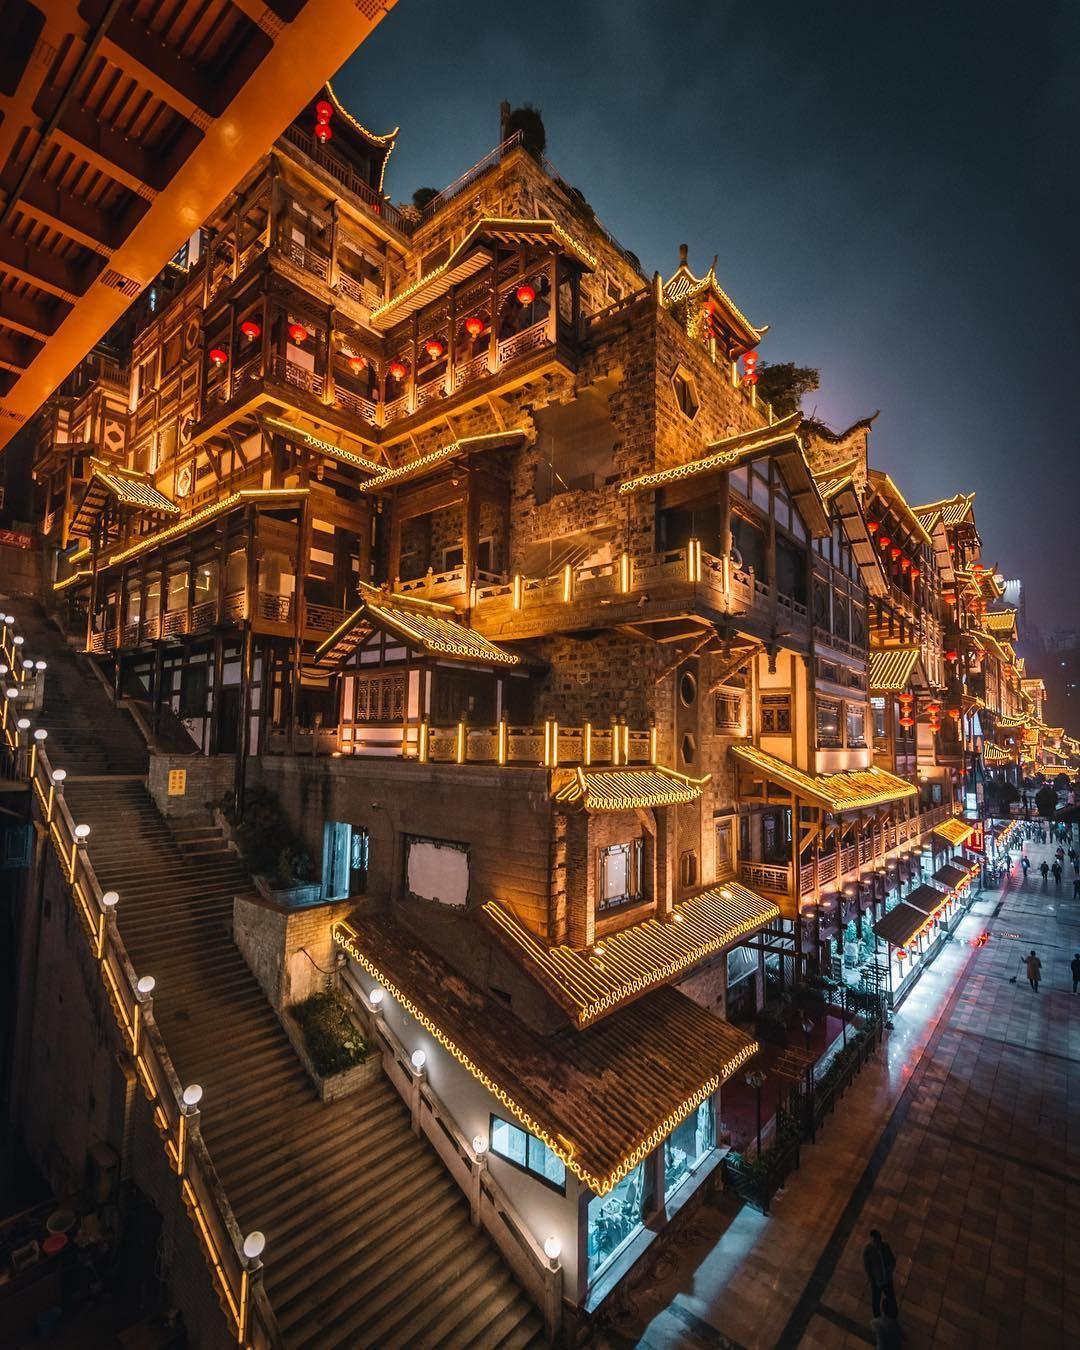 Tristan Zhou 周哲成 On Instagram Spirited Away 中国建築 旅行参考イメージまとめ 都市景観